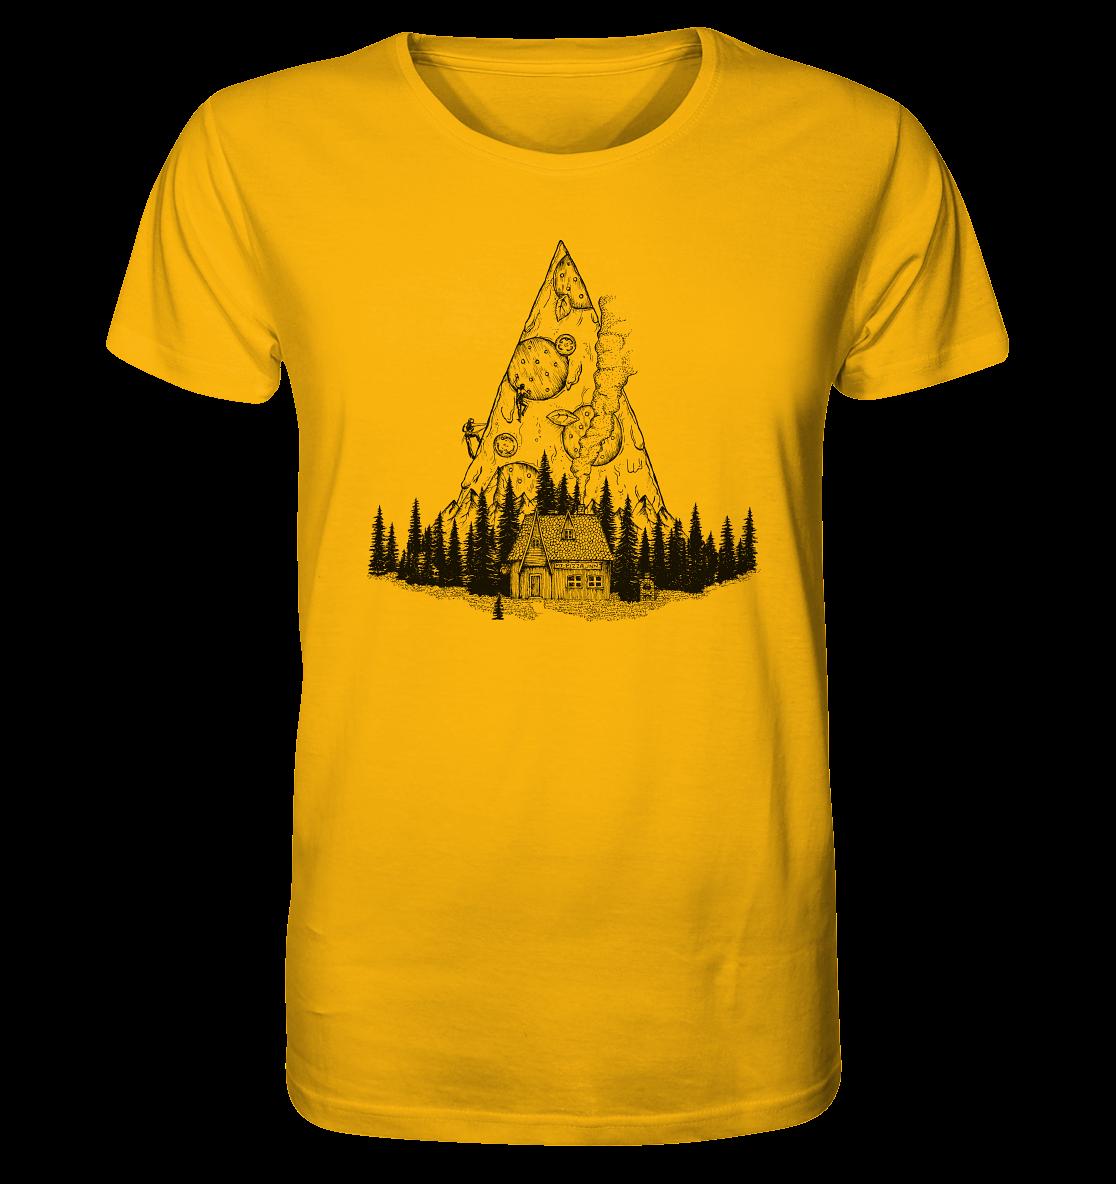 front-organic-shirt-fab40d-1116x-6.png